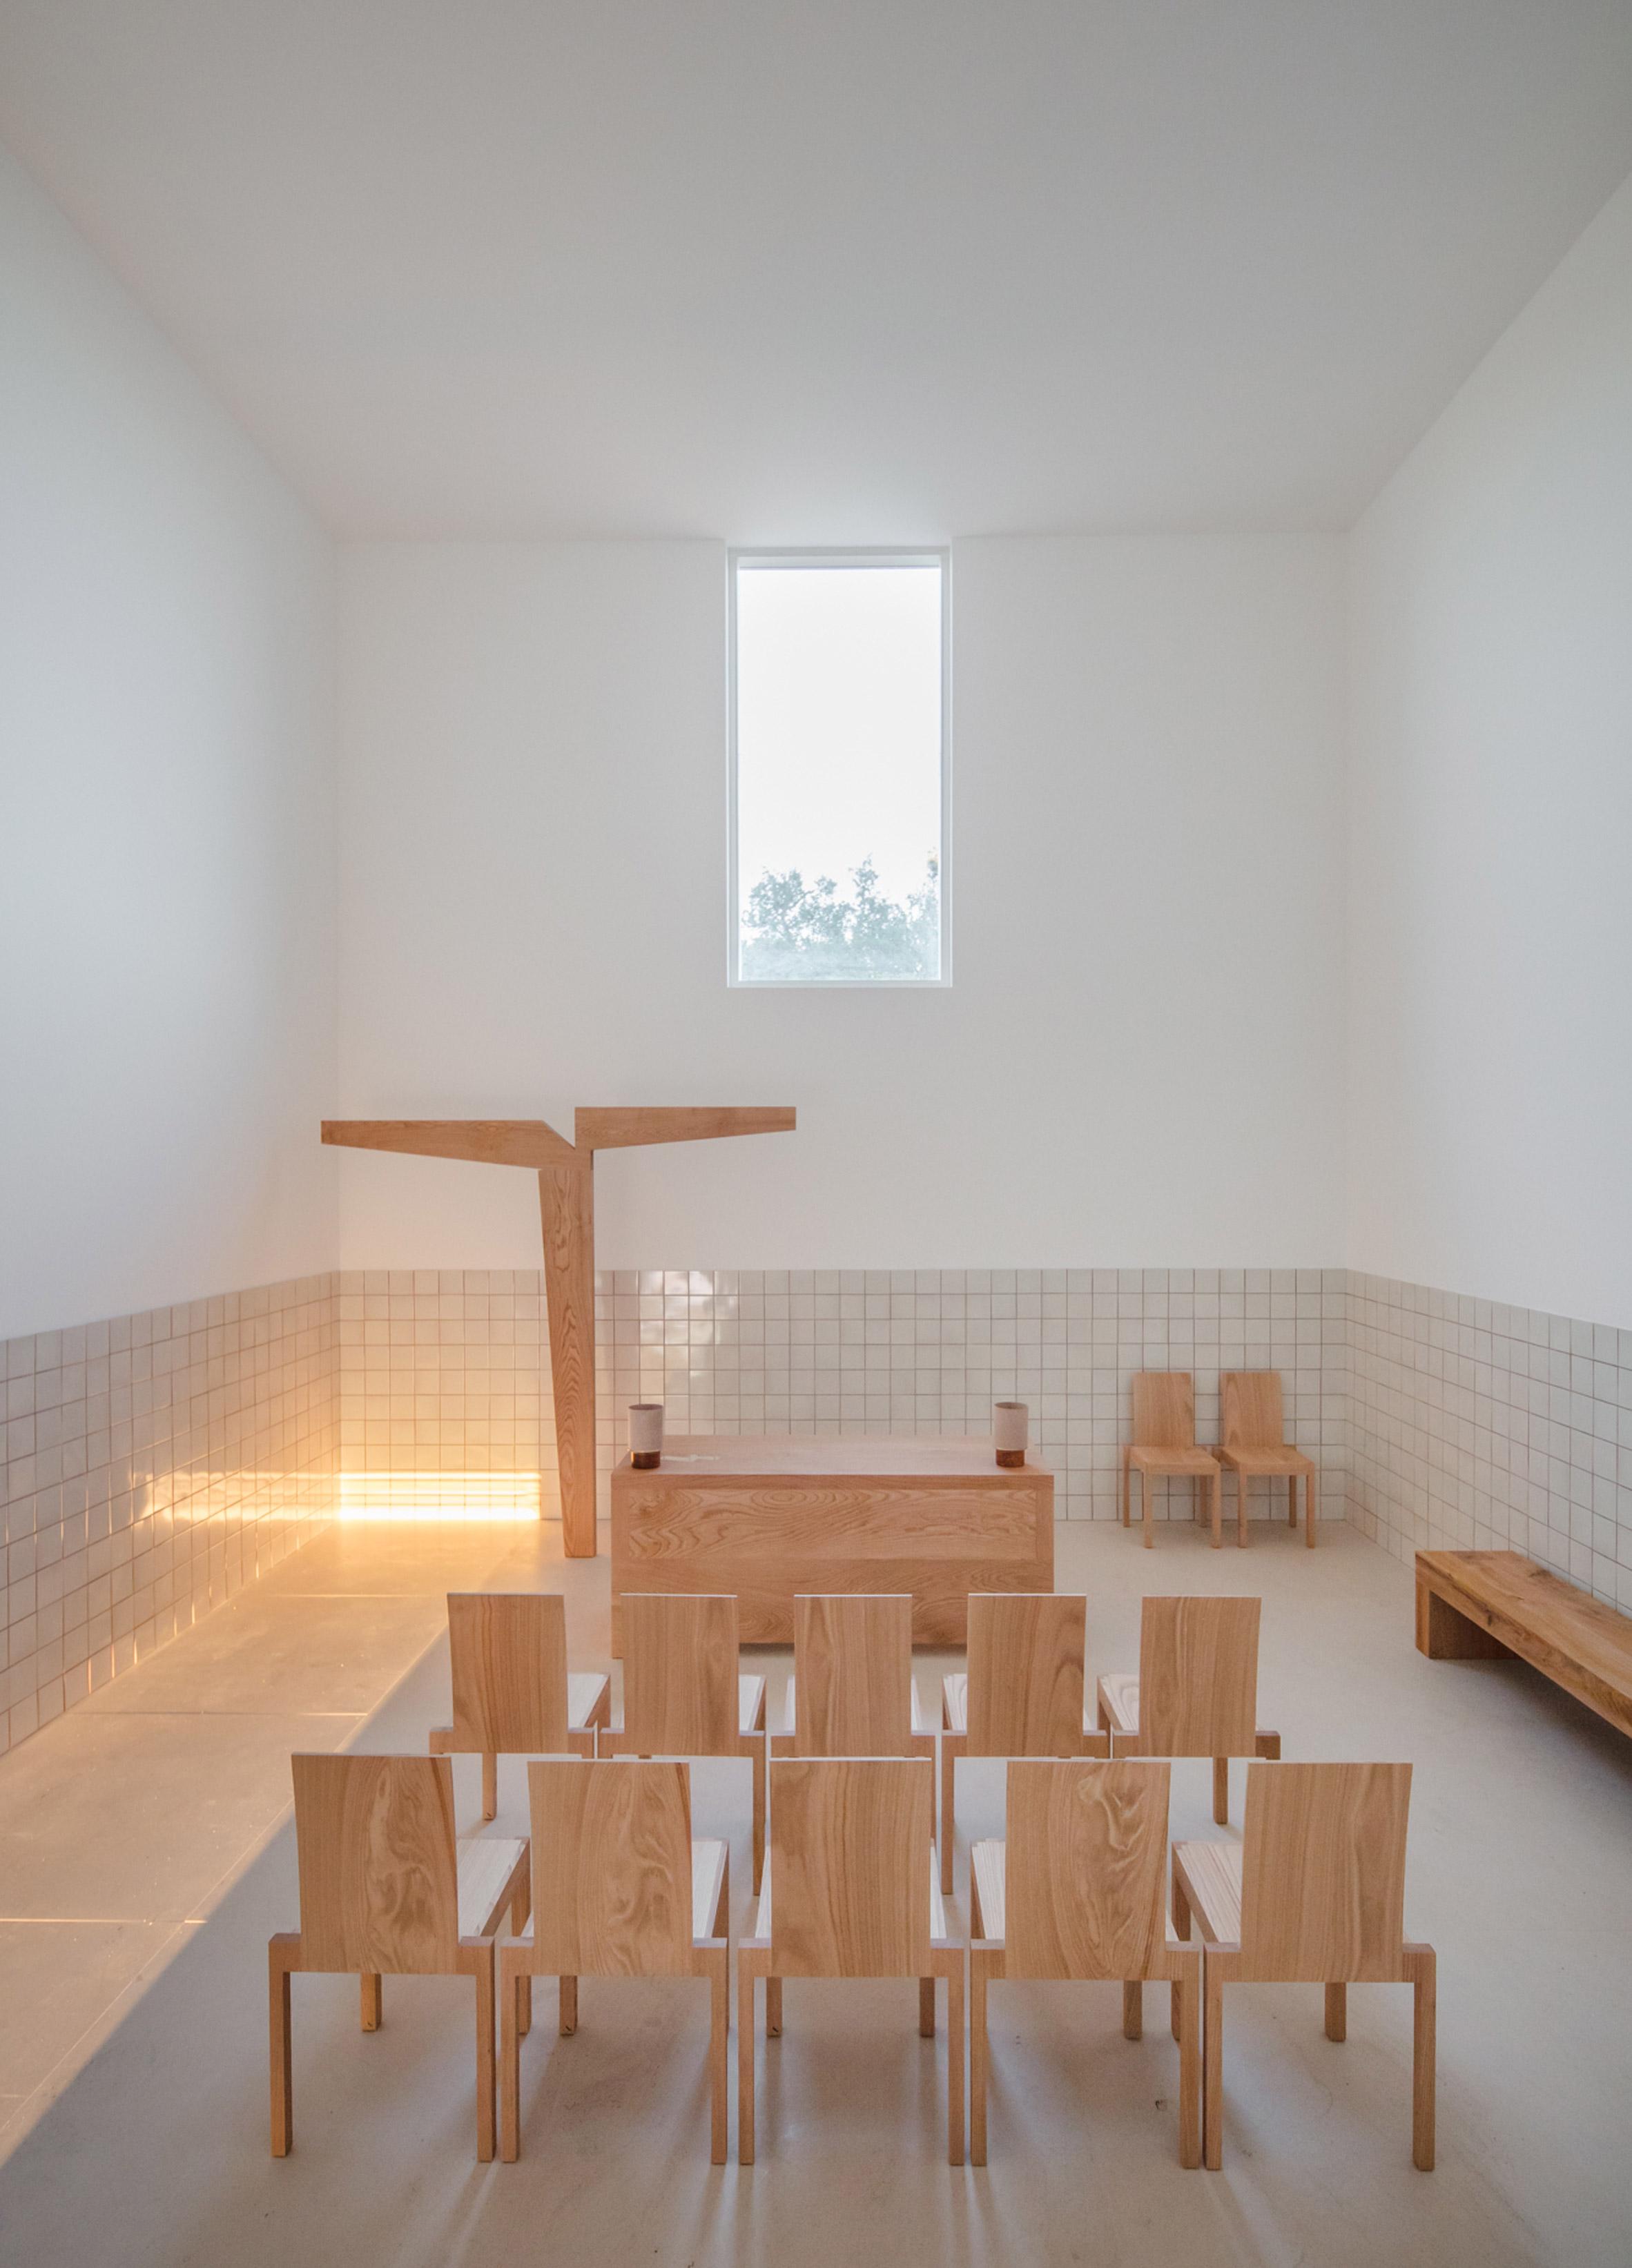 alvaro-siza-viera-capela-do-monte-chapel-algarve_dezeen_2364_col_14